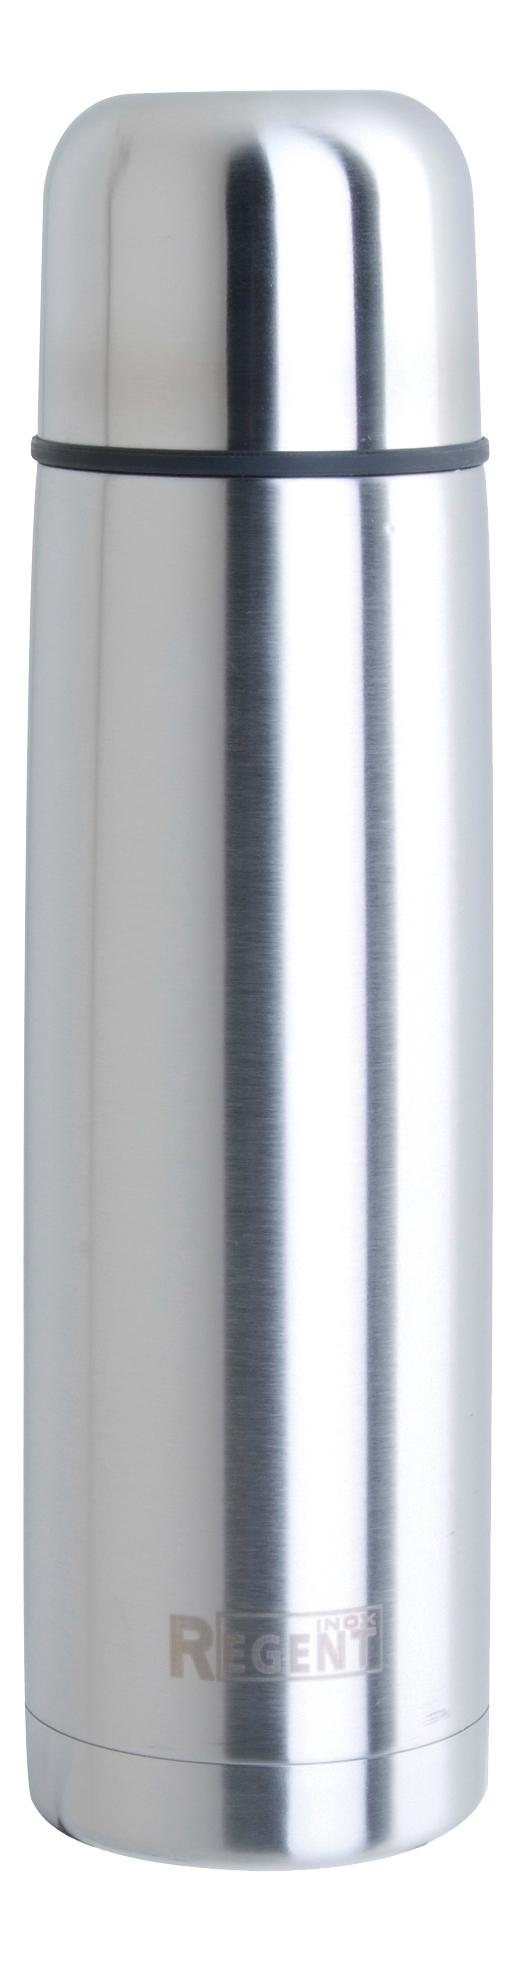 REGENT INOX BULLET 93-TE-B-1-500